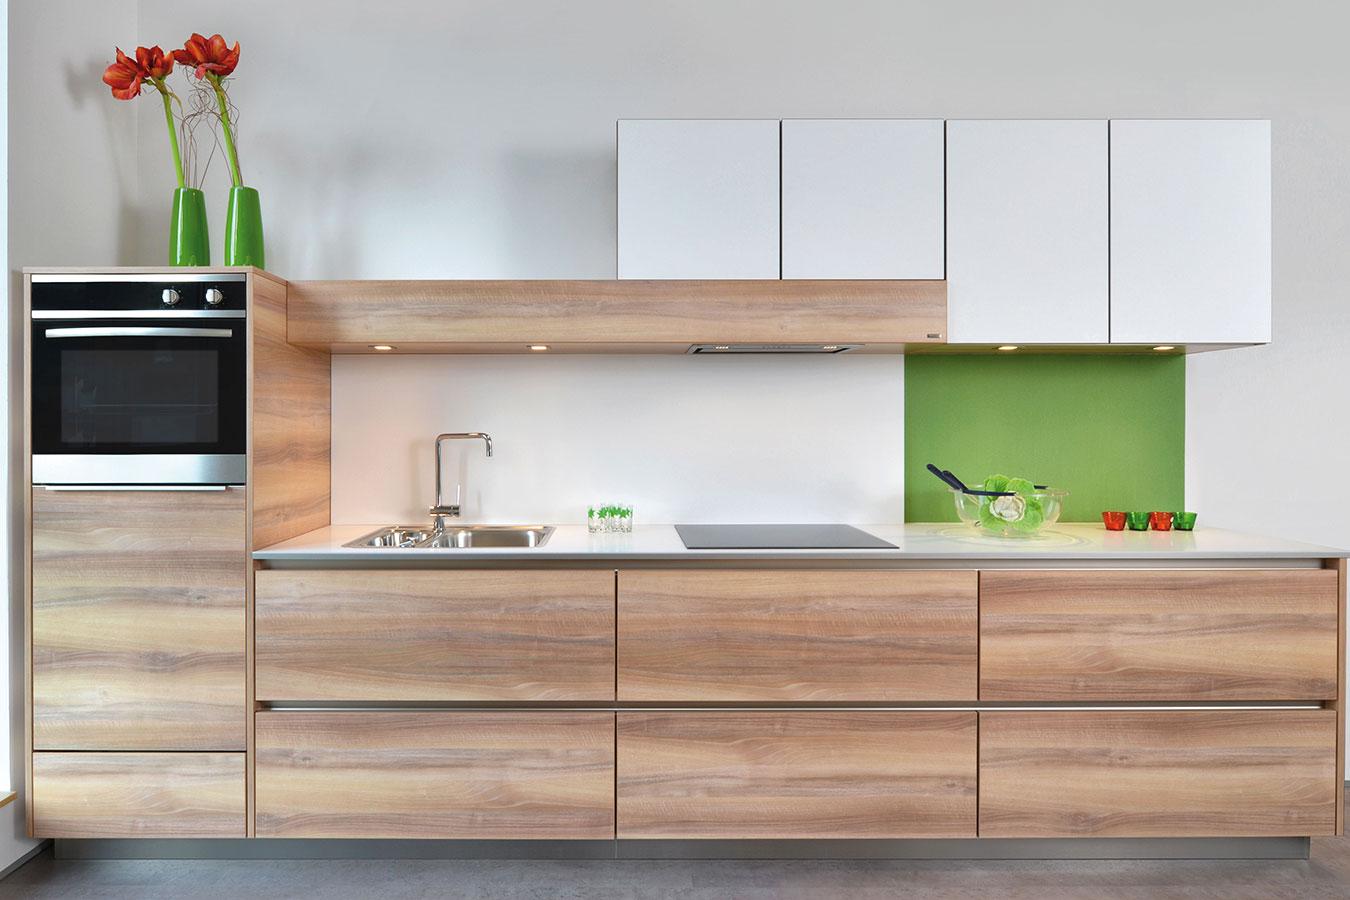 Full Size of Büro Küche Design Büroküche Nutzungsdauer Büroküche Teeküche Brandschutz Büro Küche Küche Büroküche